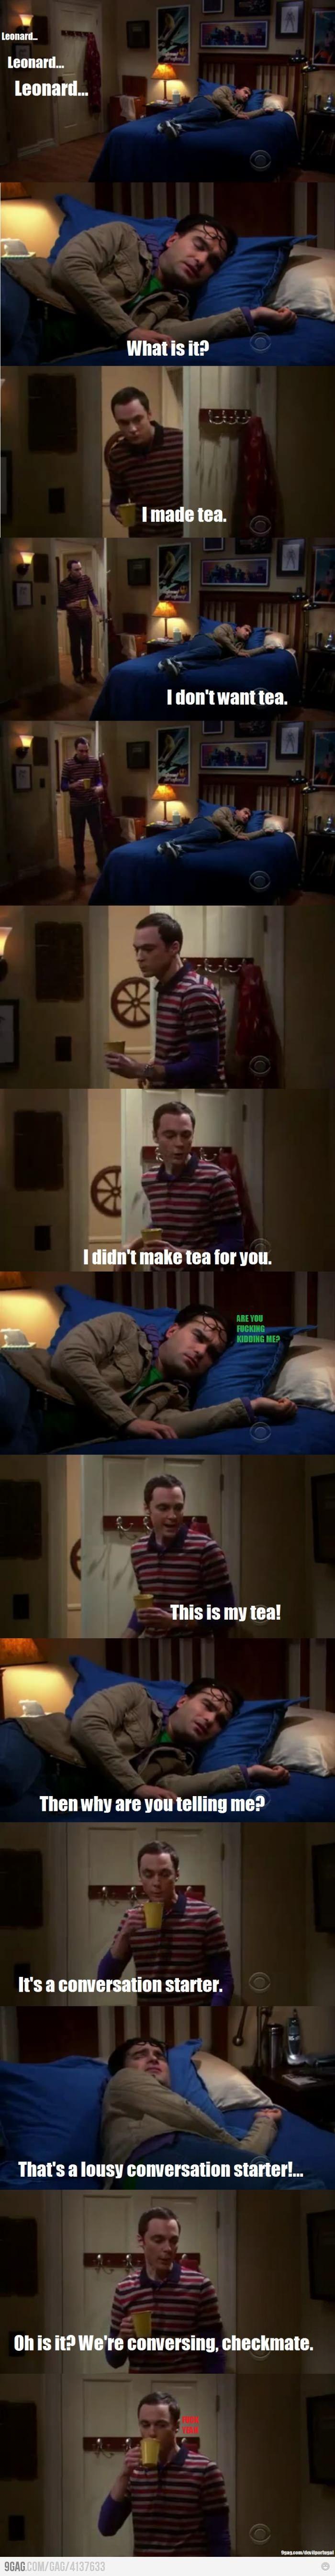 (this makes me want to start watching big bang theory) Big Bang Theory! I love Sheldon!  BAZINGA!!!